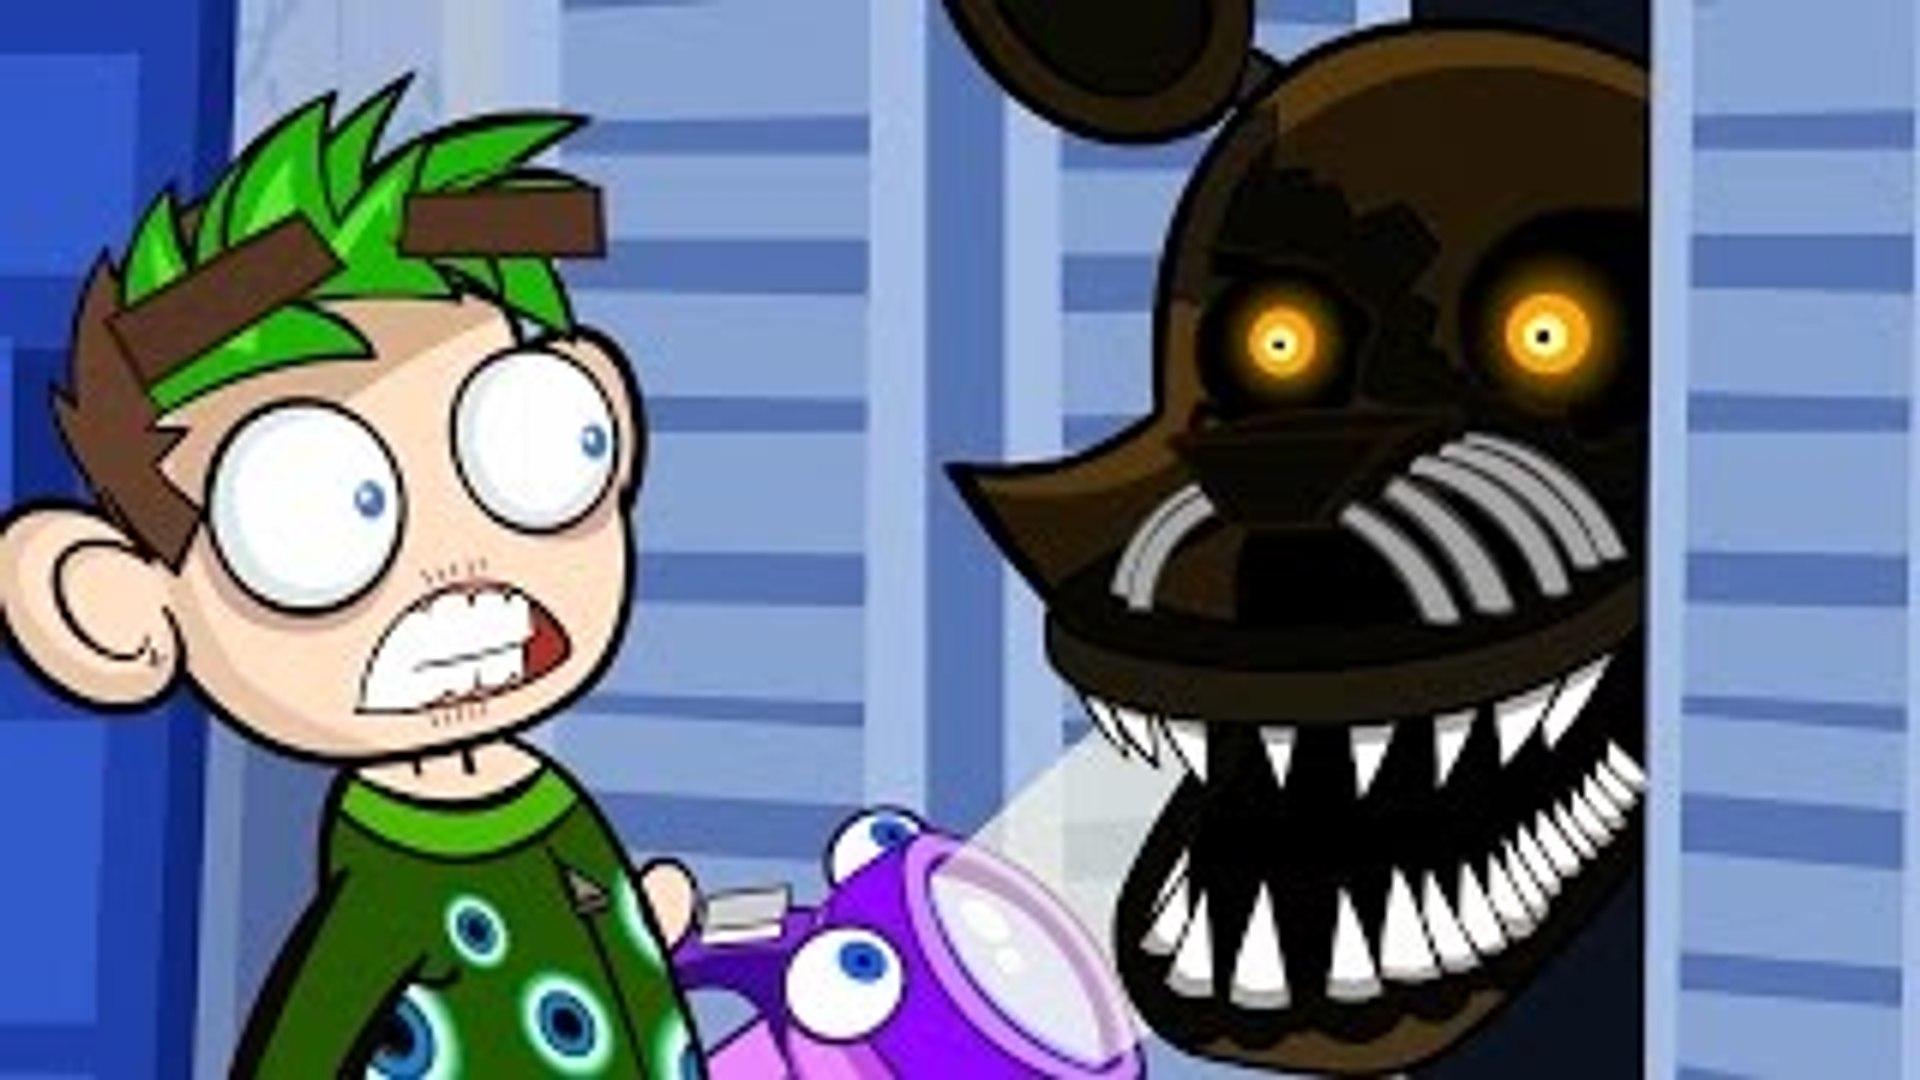 Five Nights At Freddys 3 & 4 Animation   Jacksepticeye Animated